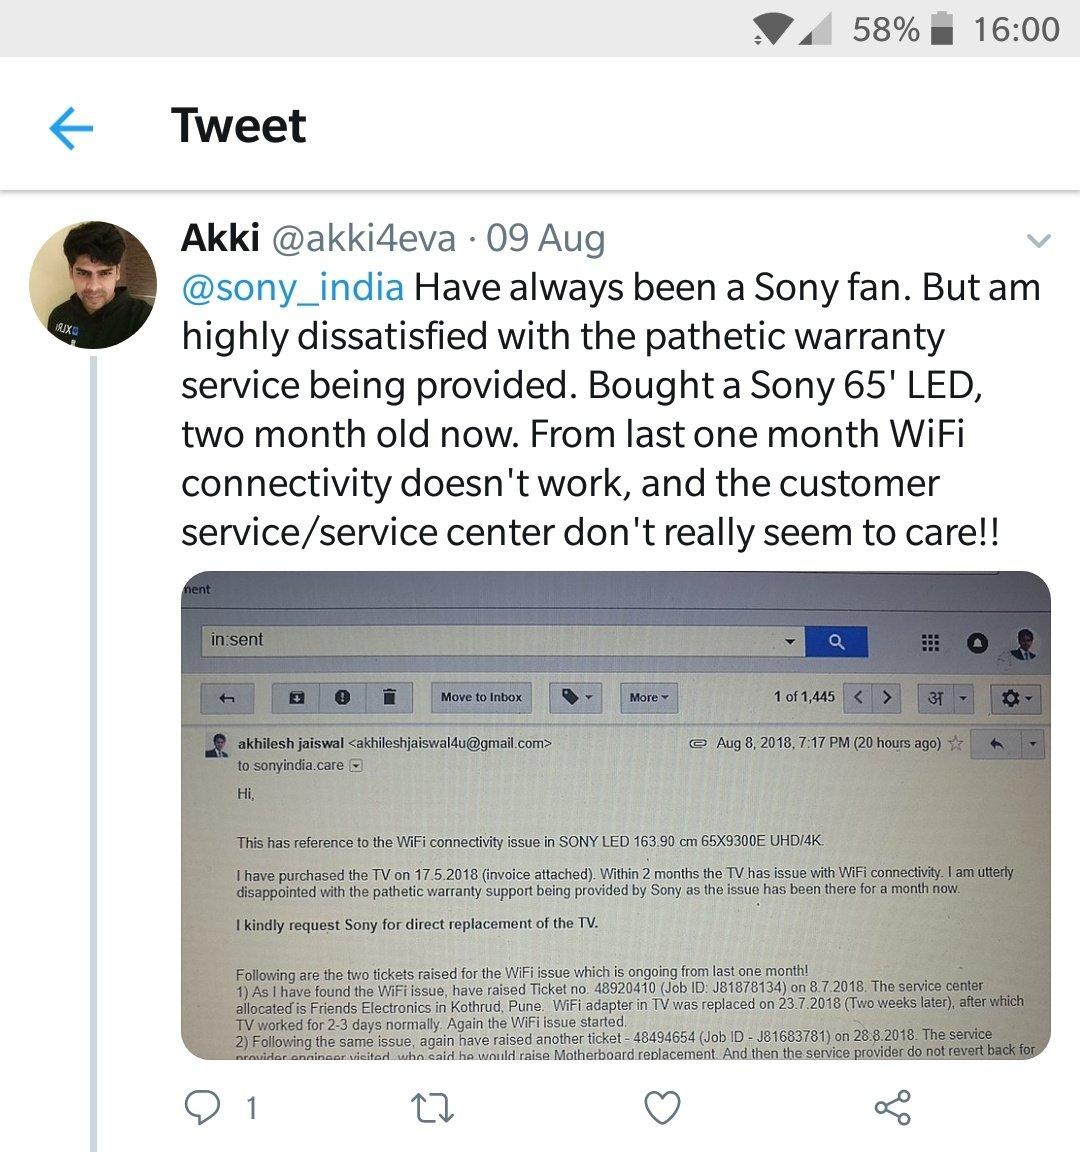 Sony India on Twitter: